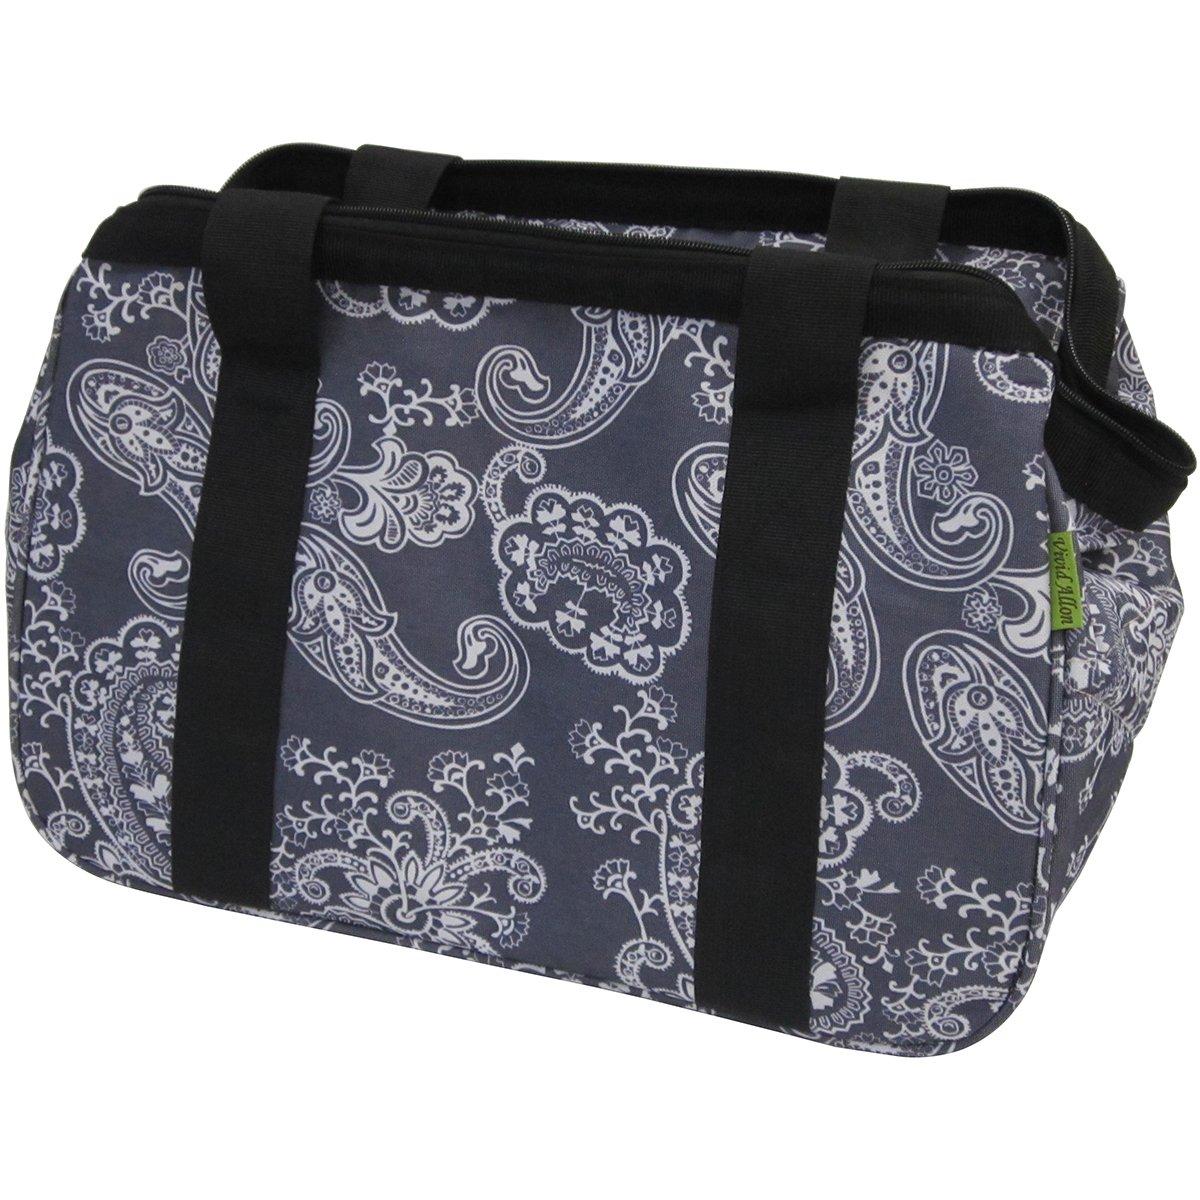 Vivid Allon JanetBasket Lace Eco Bag EB030